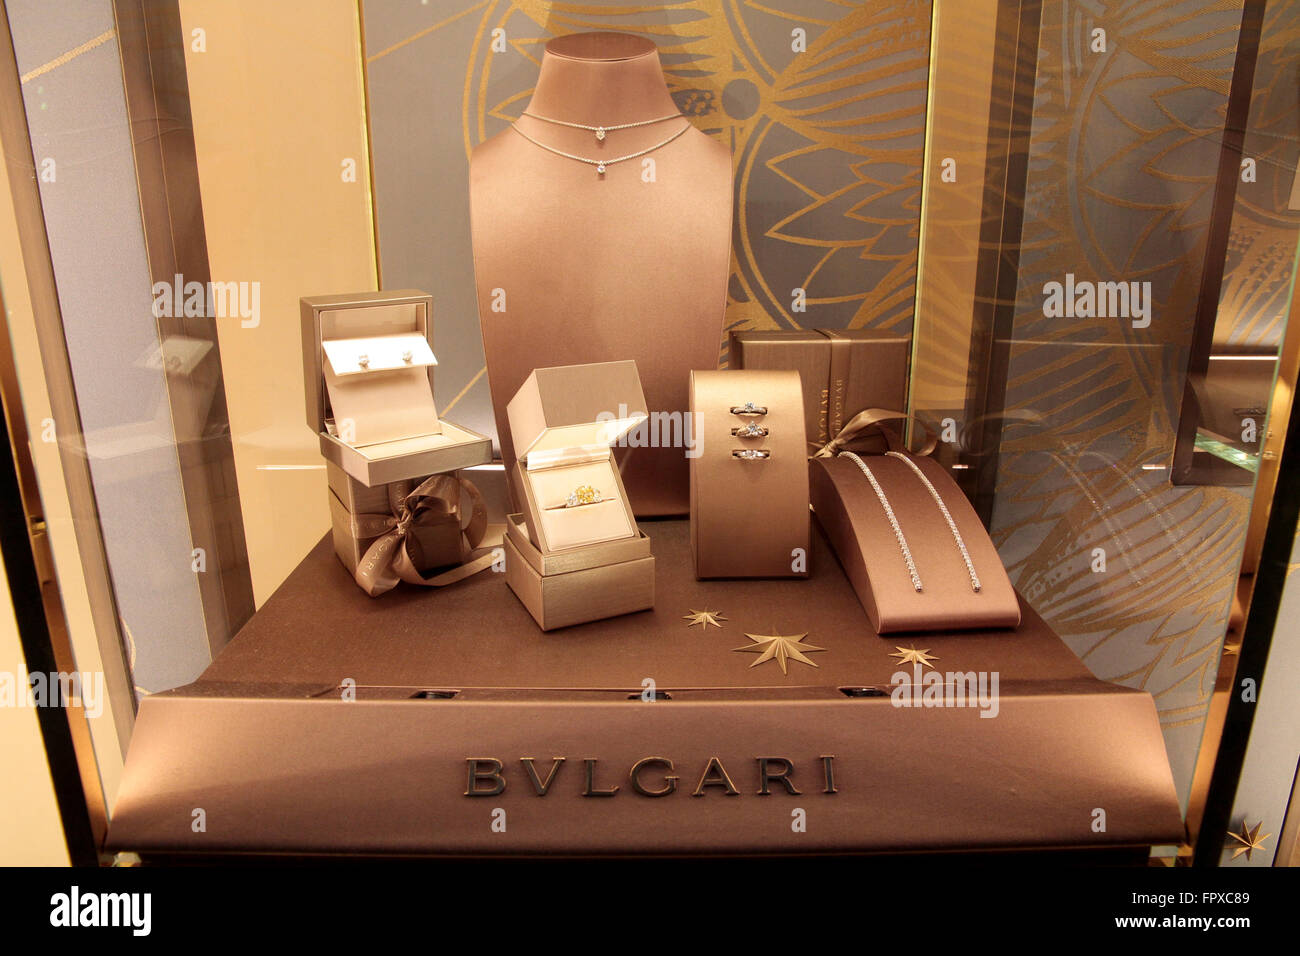 ae244deac50 Italian Brand Of Jewelery Photos   Italian Brand Of Jewelery Images ...